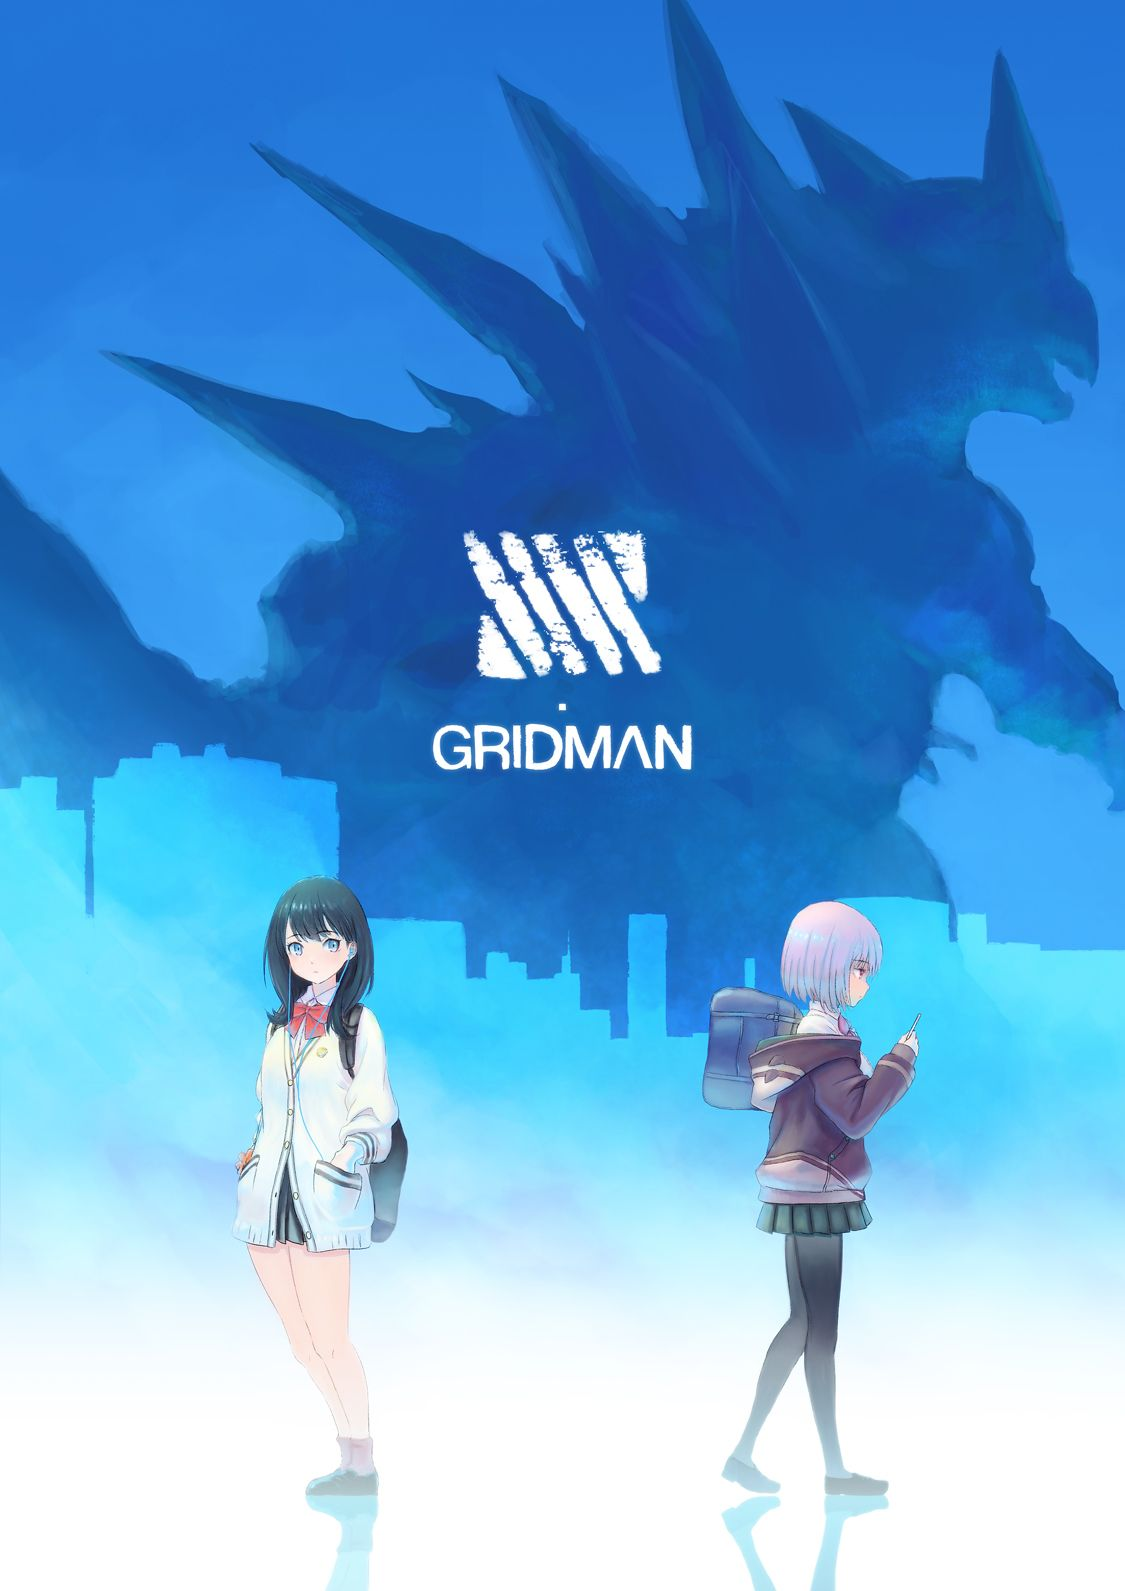 Ssss Gridman By Pixiv Id キャラクター イラスト アニメイラスト イラスト